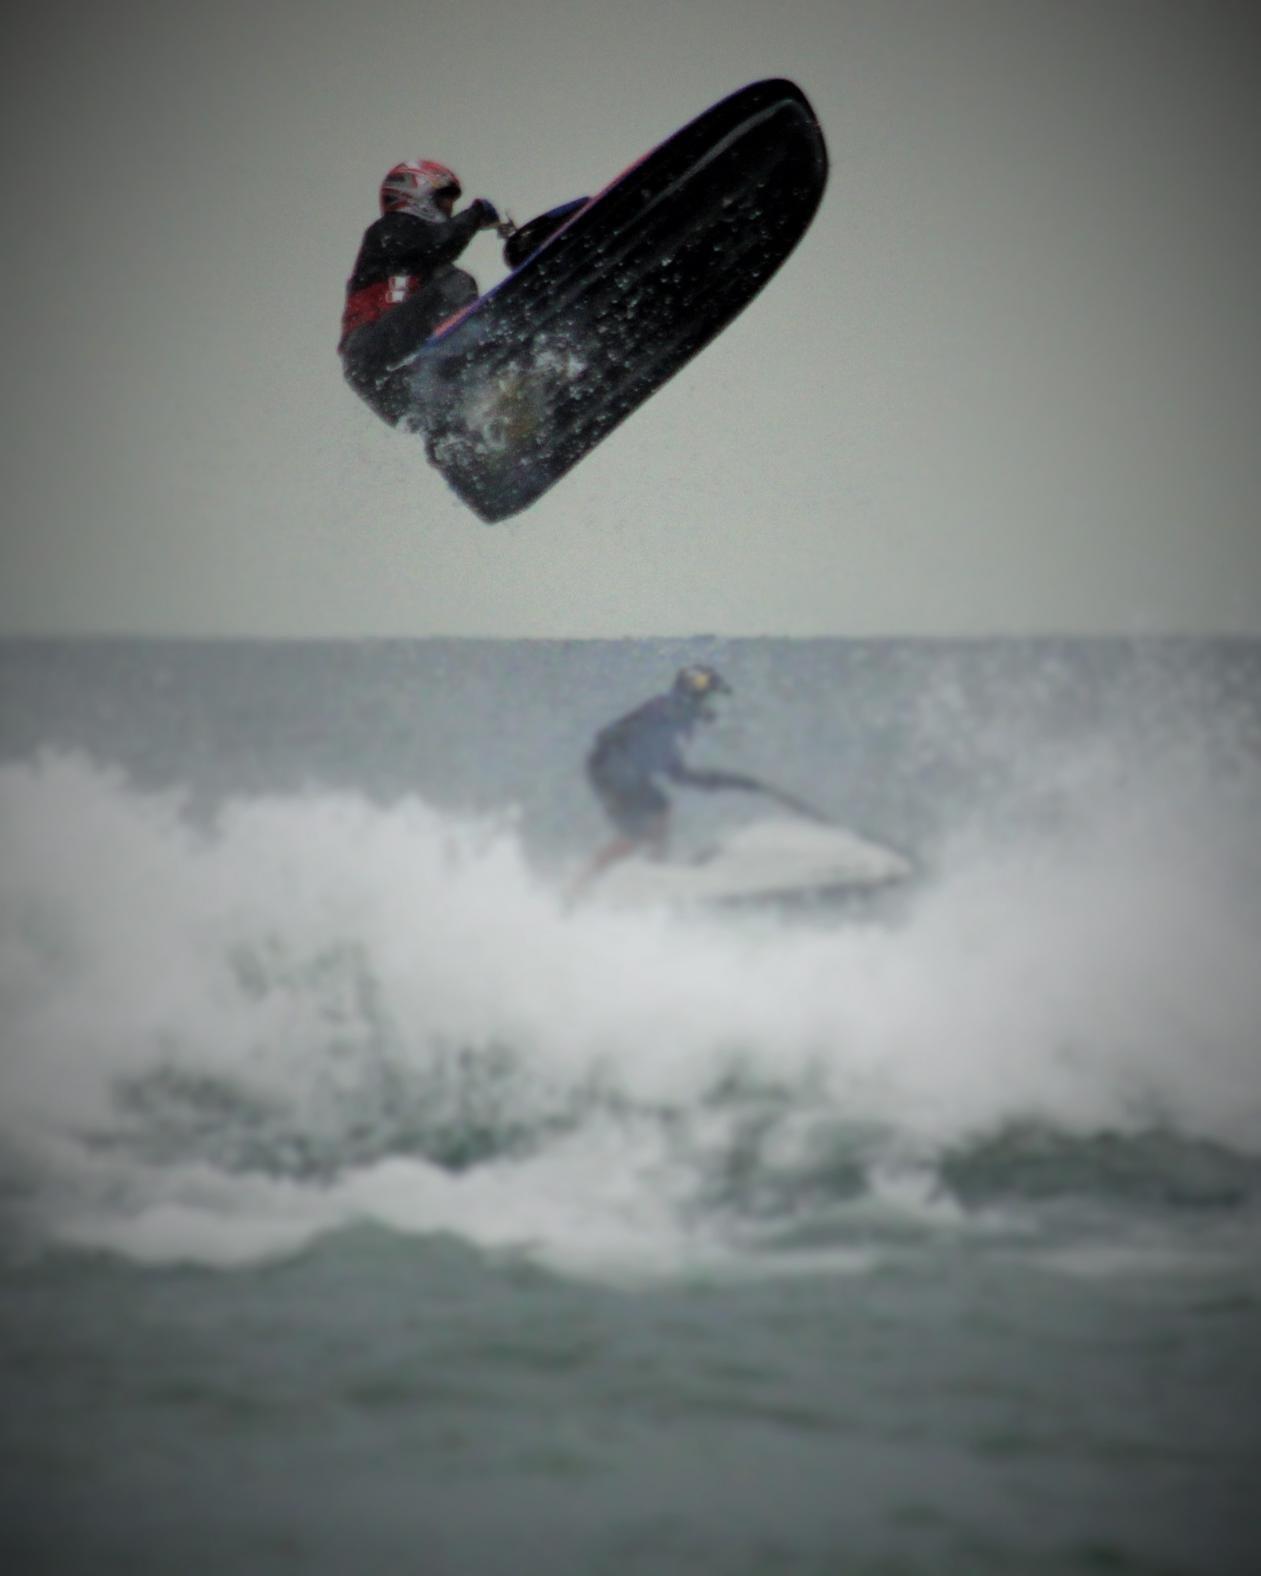 Cool backflip shot on ski!  Daytona Freeride 2014-img_39085.jpg